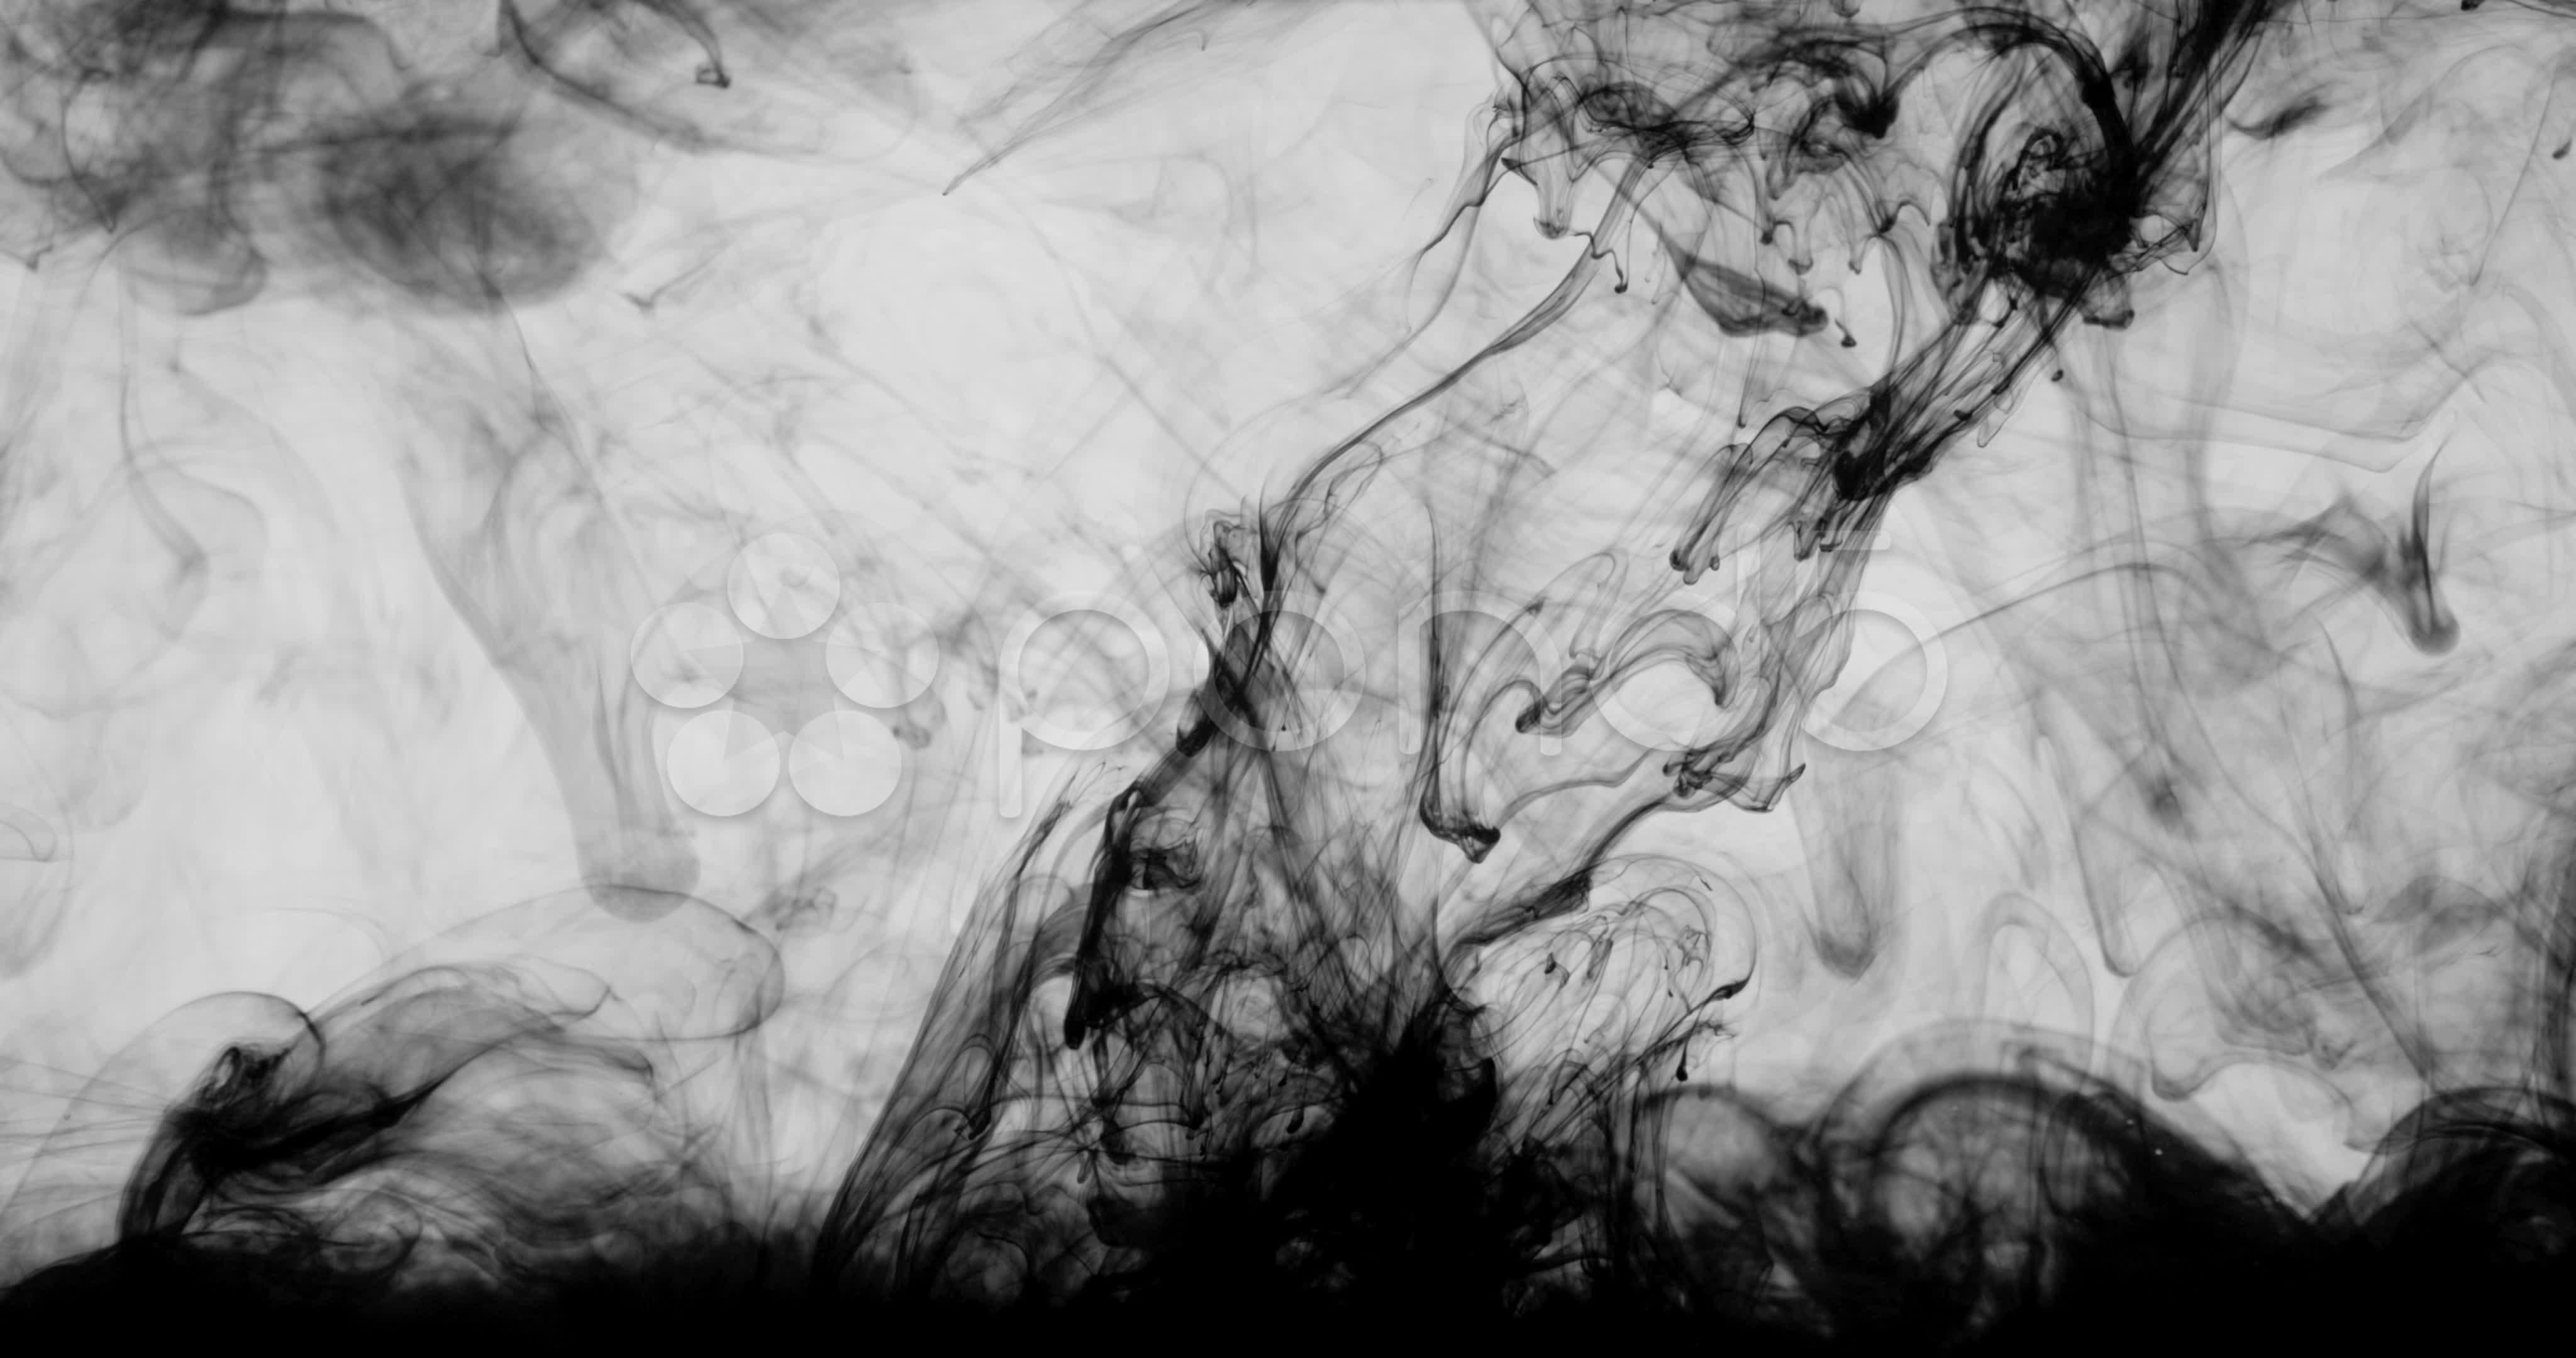 Ink background effects 4K ~ Hi Res Video #21846876